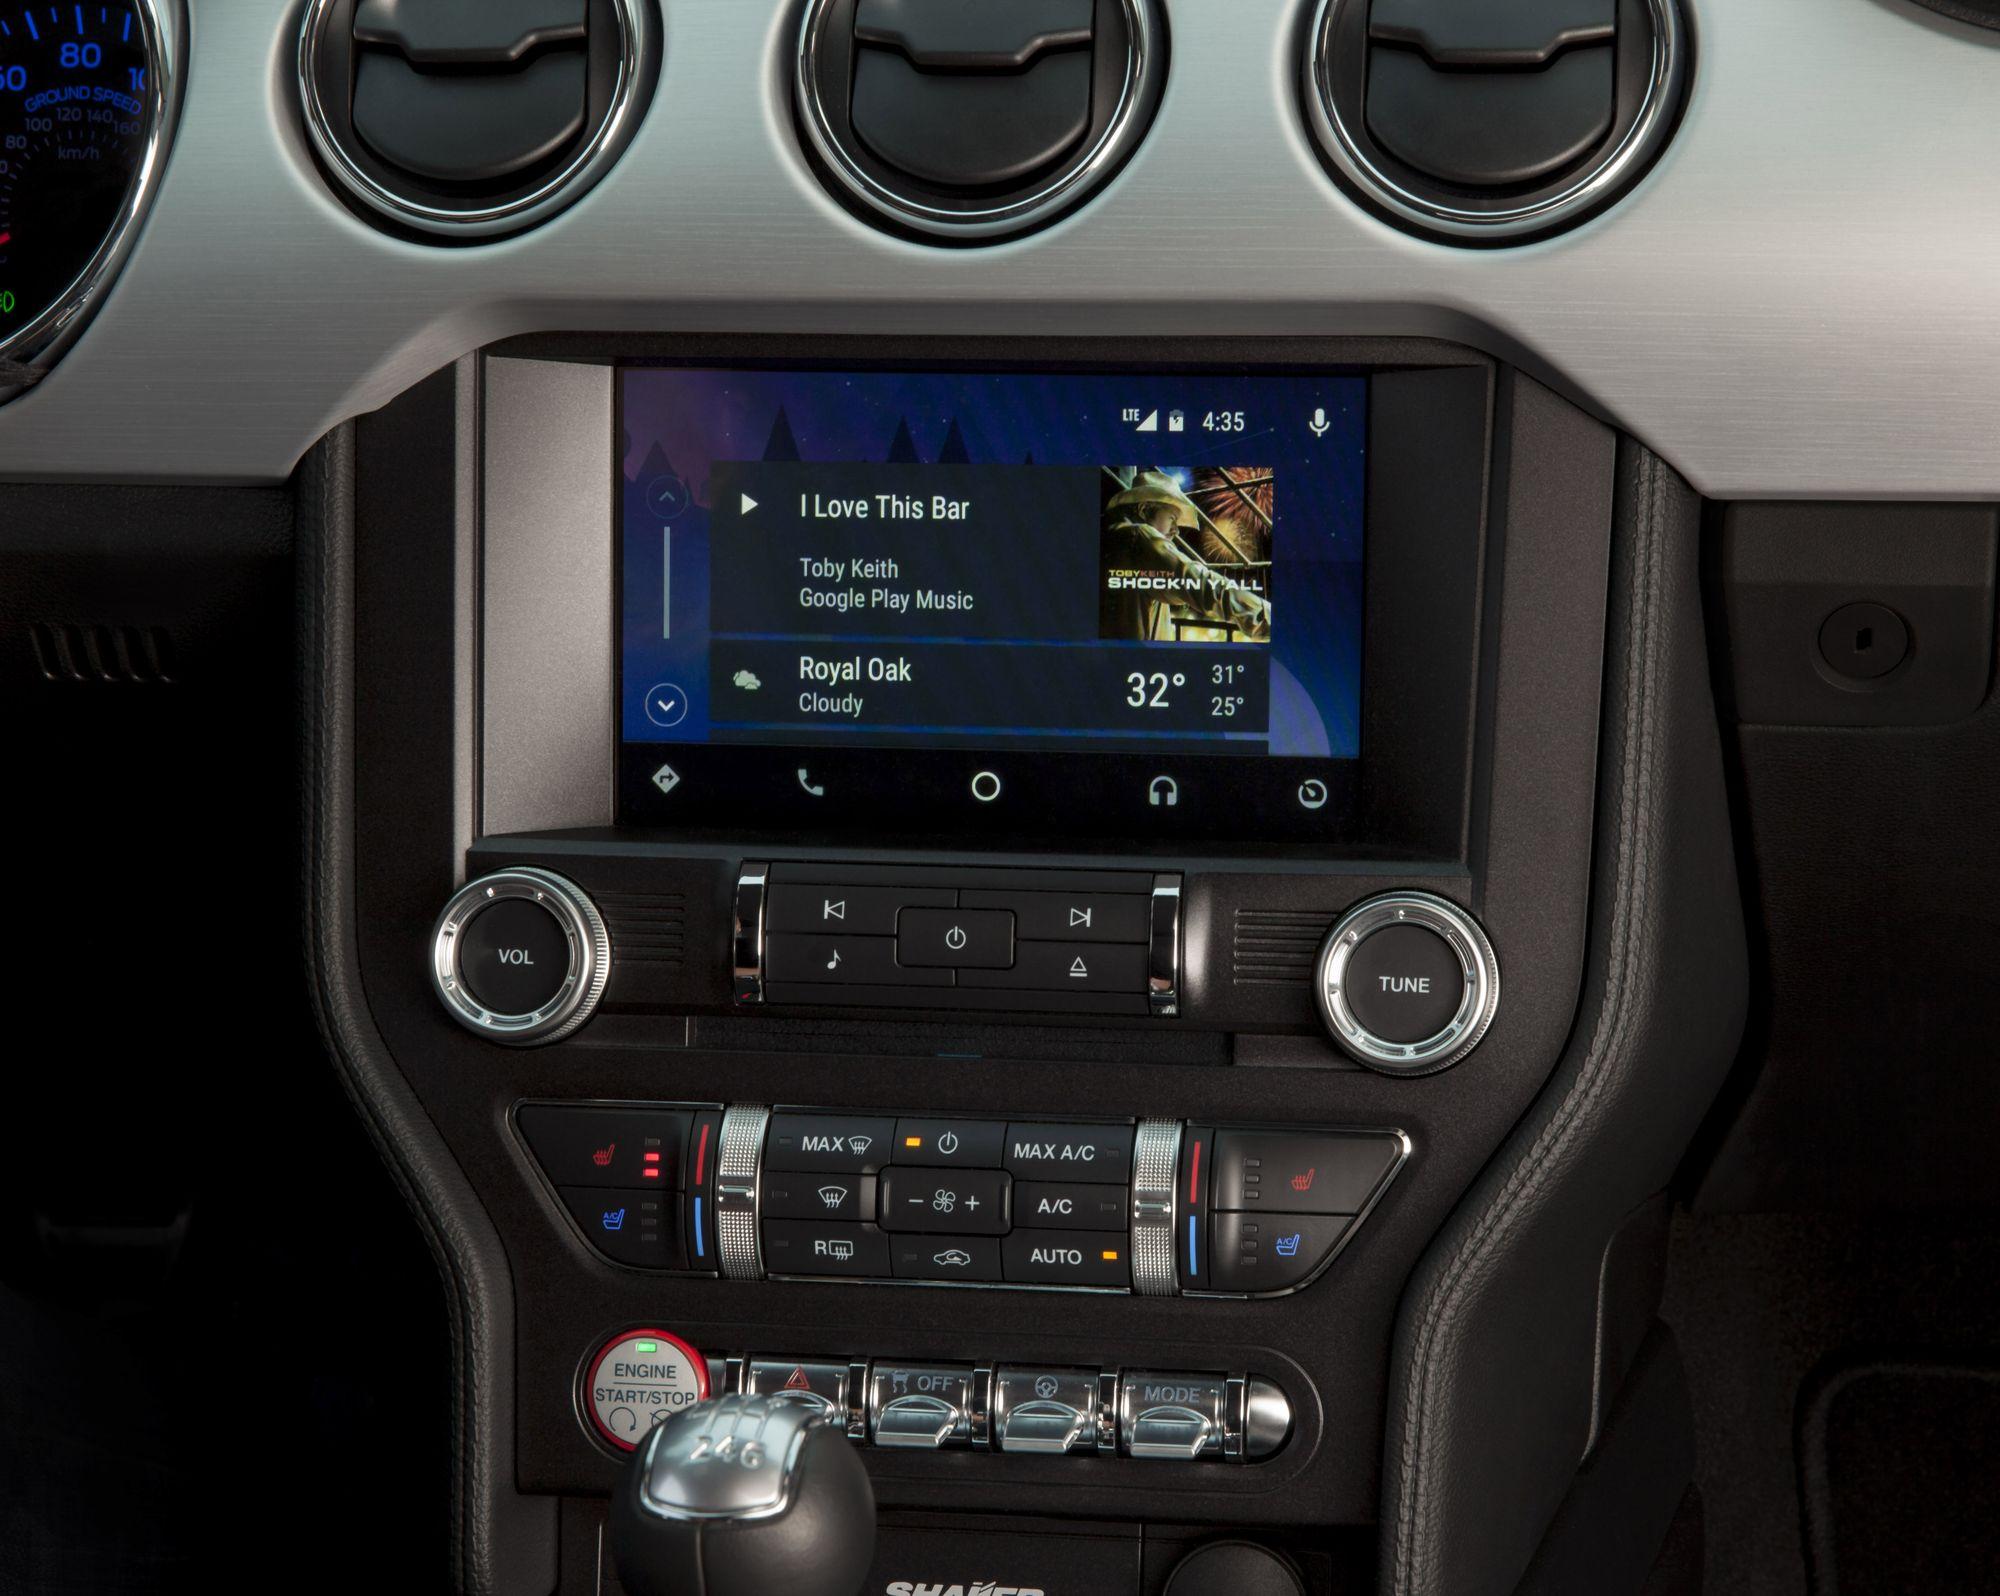 CES 2016 : Ford passe enfin à Android Auto et CarPlay